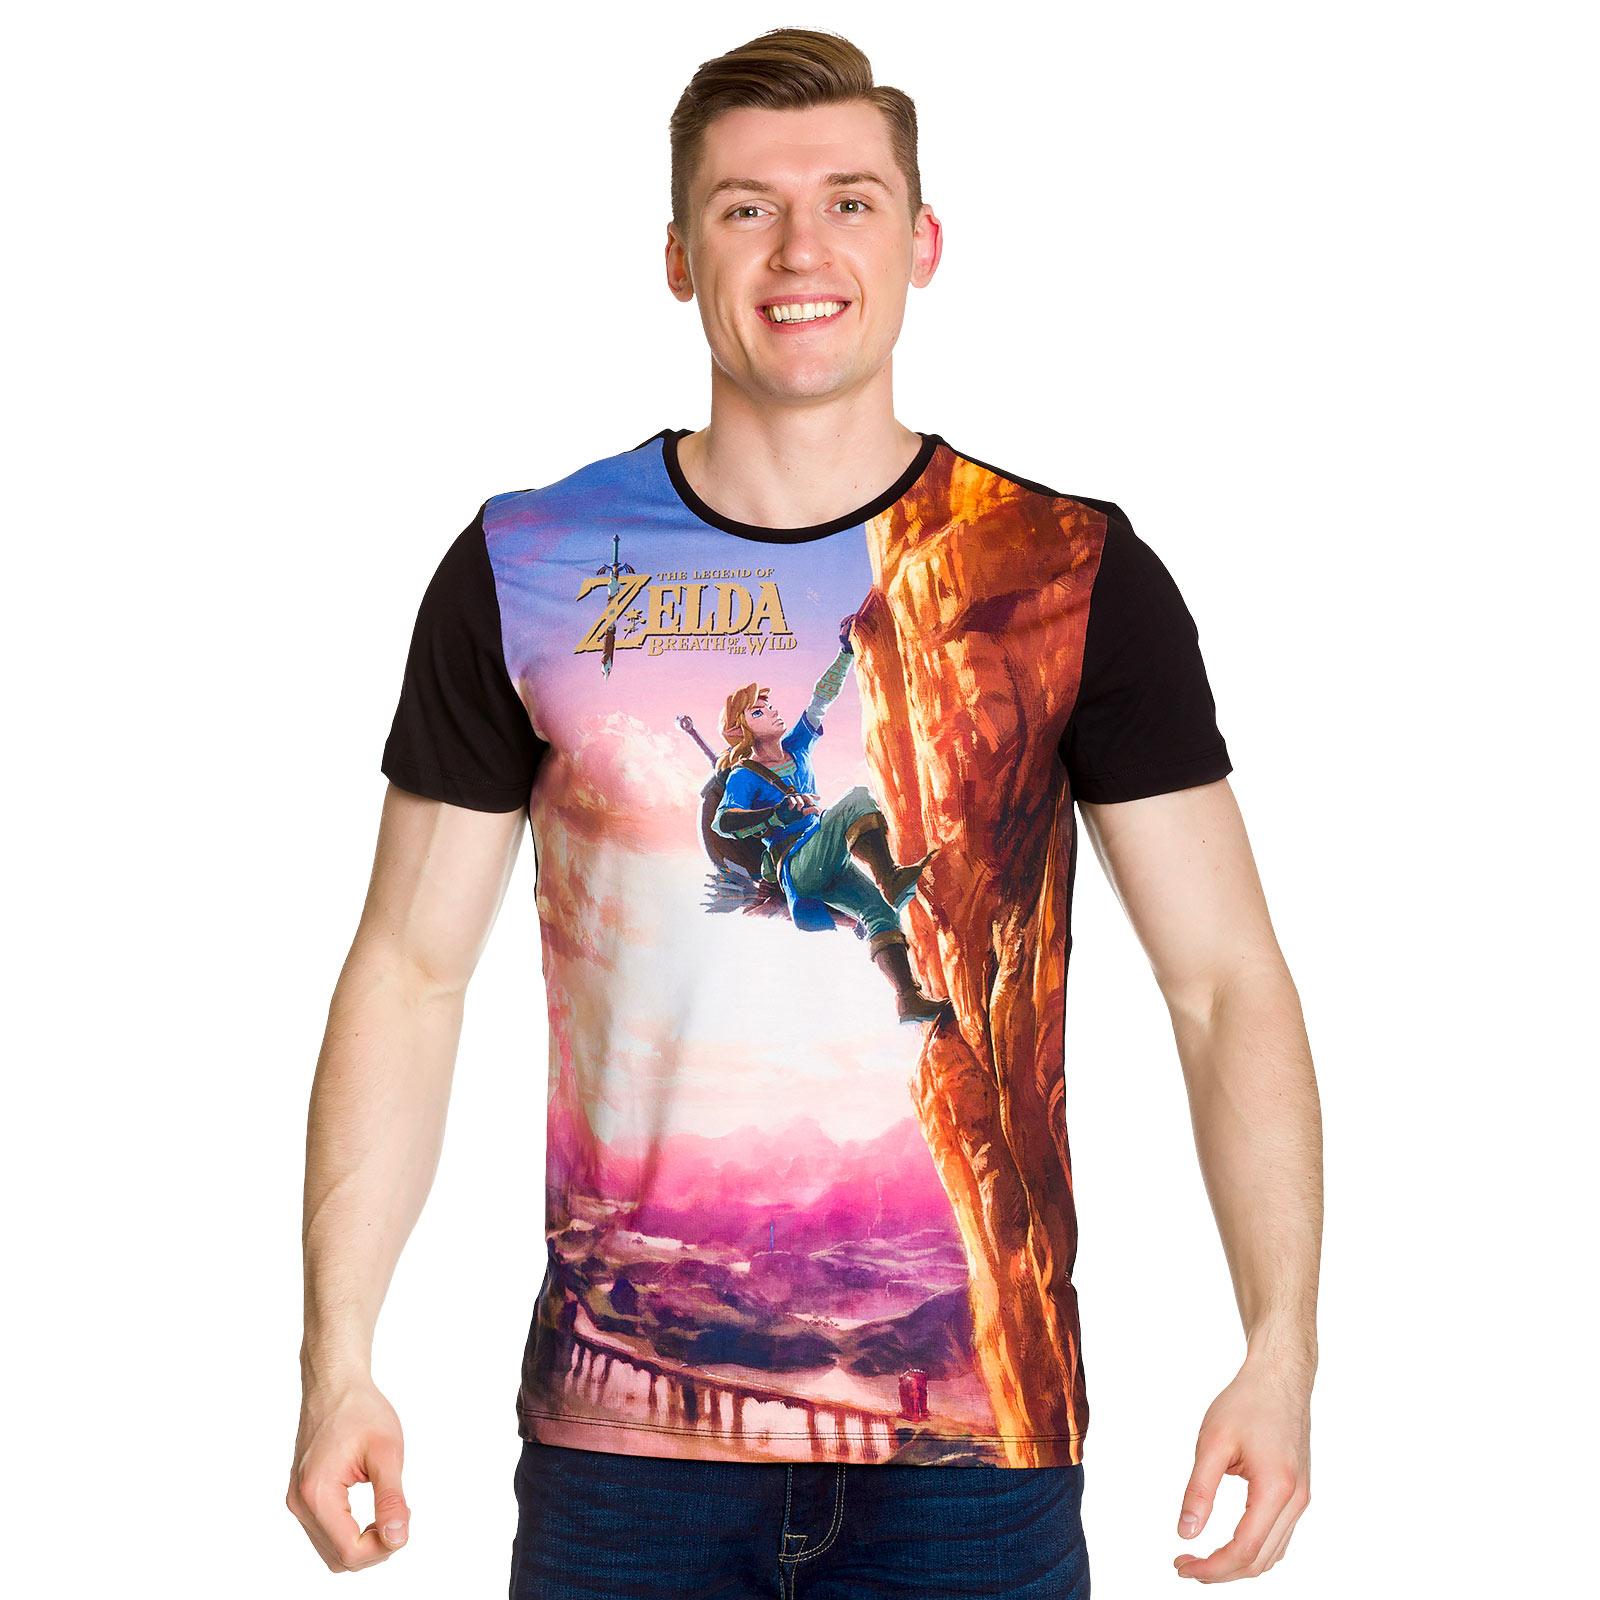 Zelda - Breath of the Wild Link Full Size T-Shirt